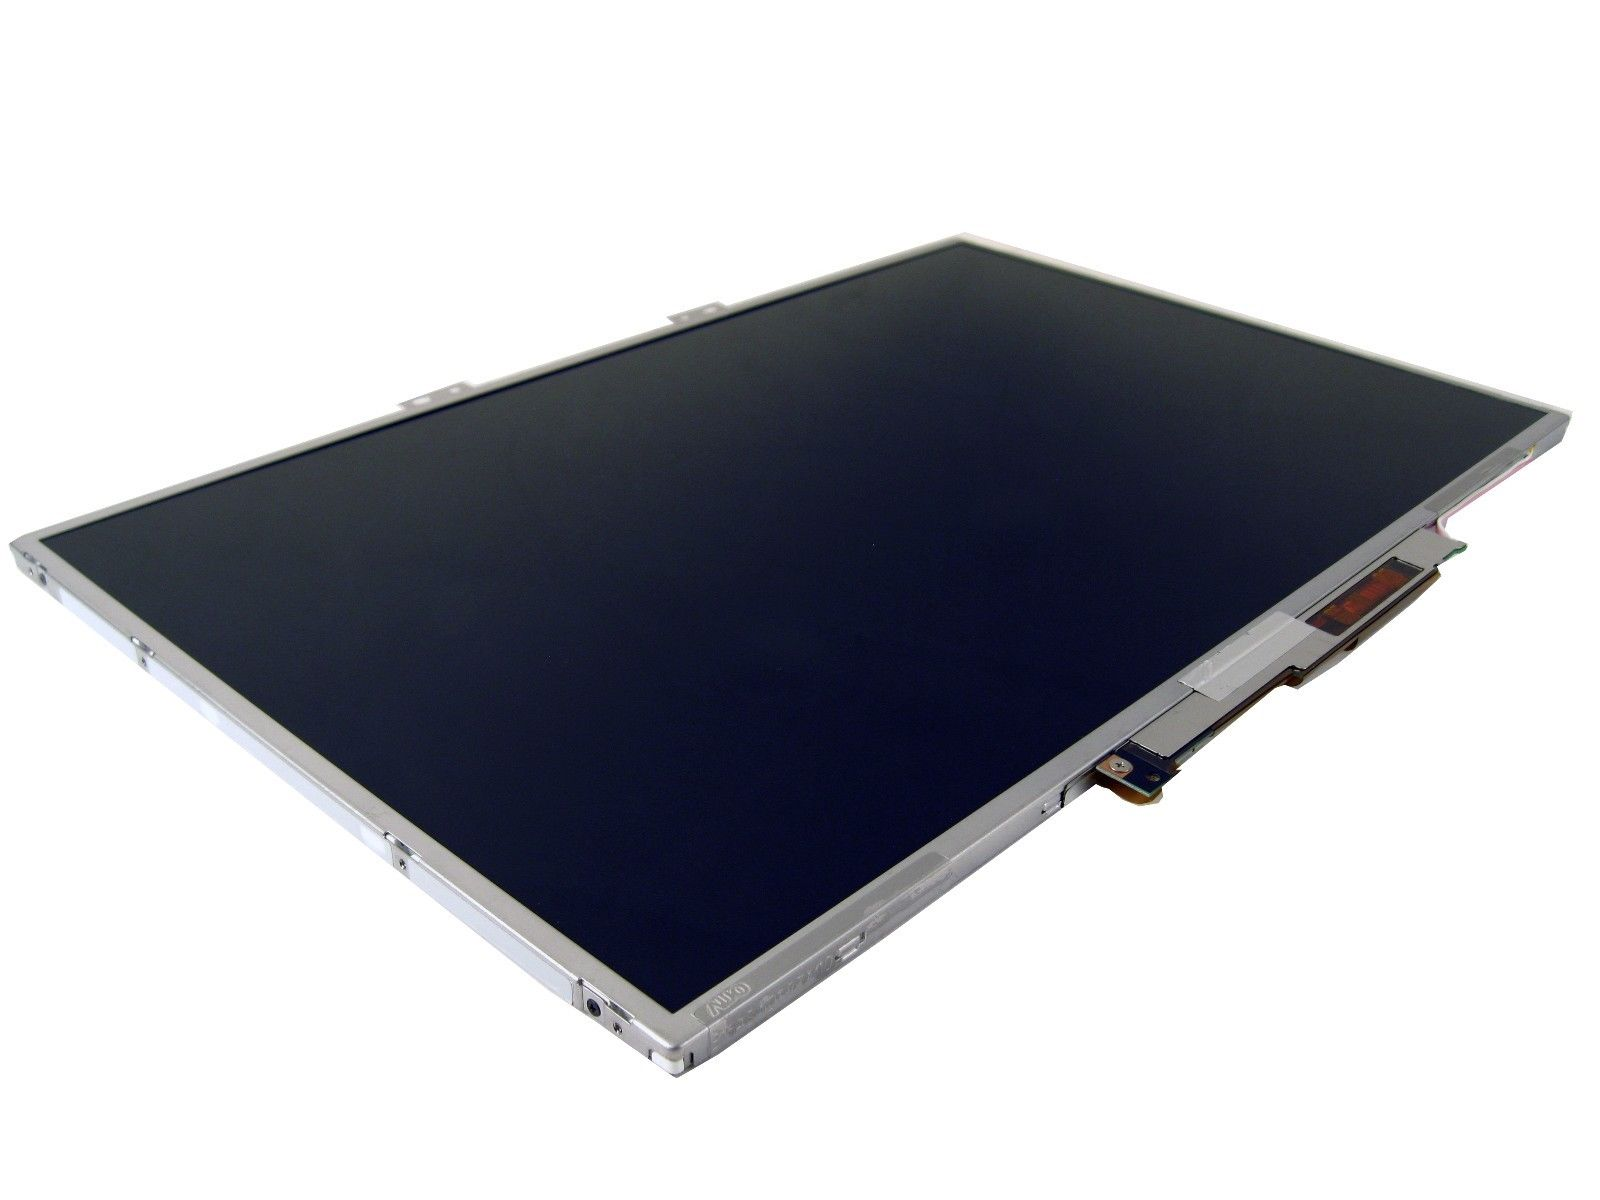 "Dell NX380 LCD Panel QD15AL01 (Rev. 04) 15.4"" WSXGA"